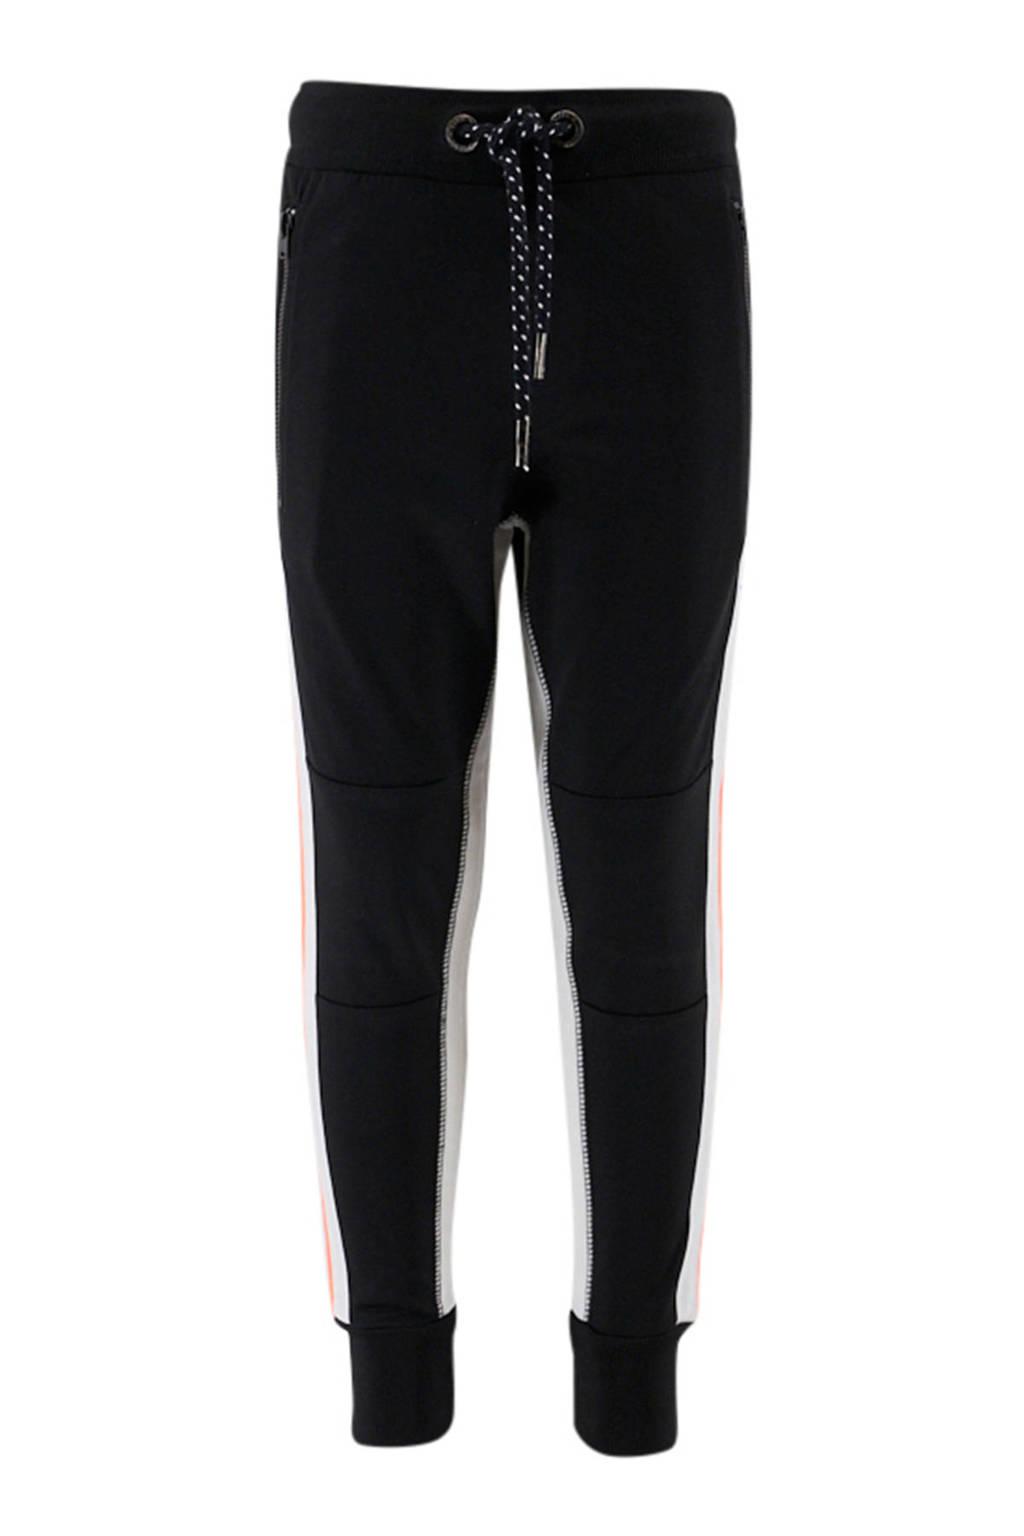 KIDDO   joggingbroek zwart/wit/oranje, Zwart/wit/oranje